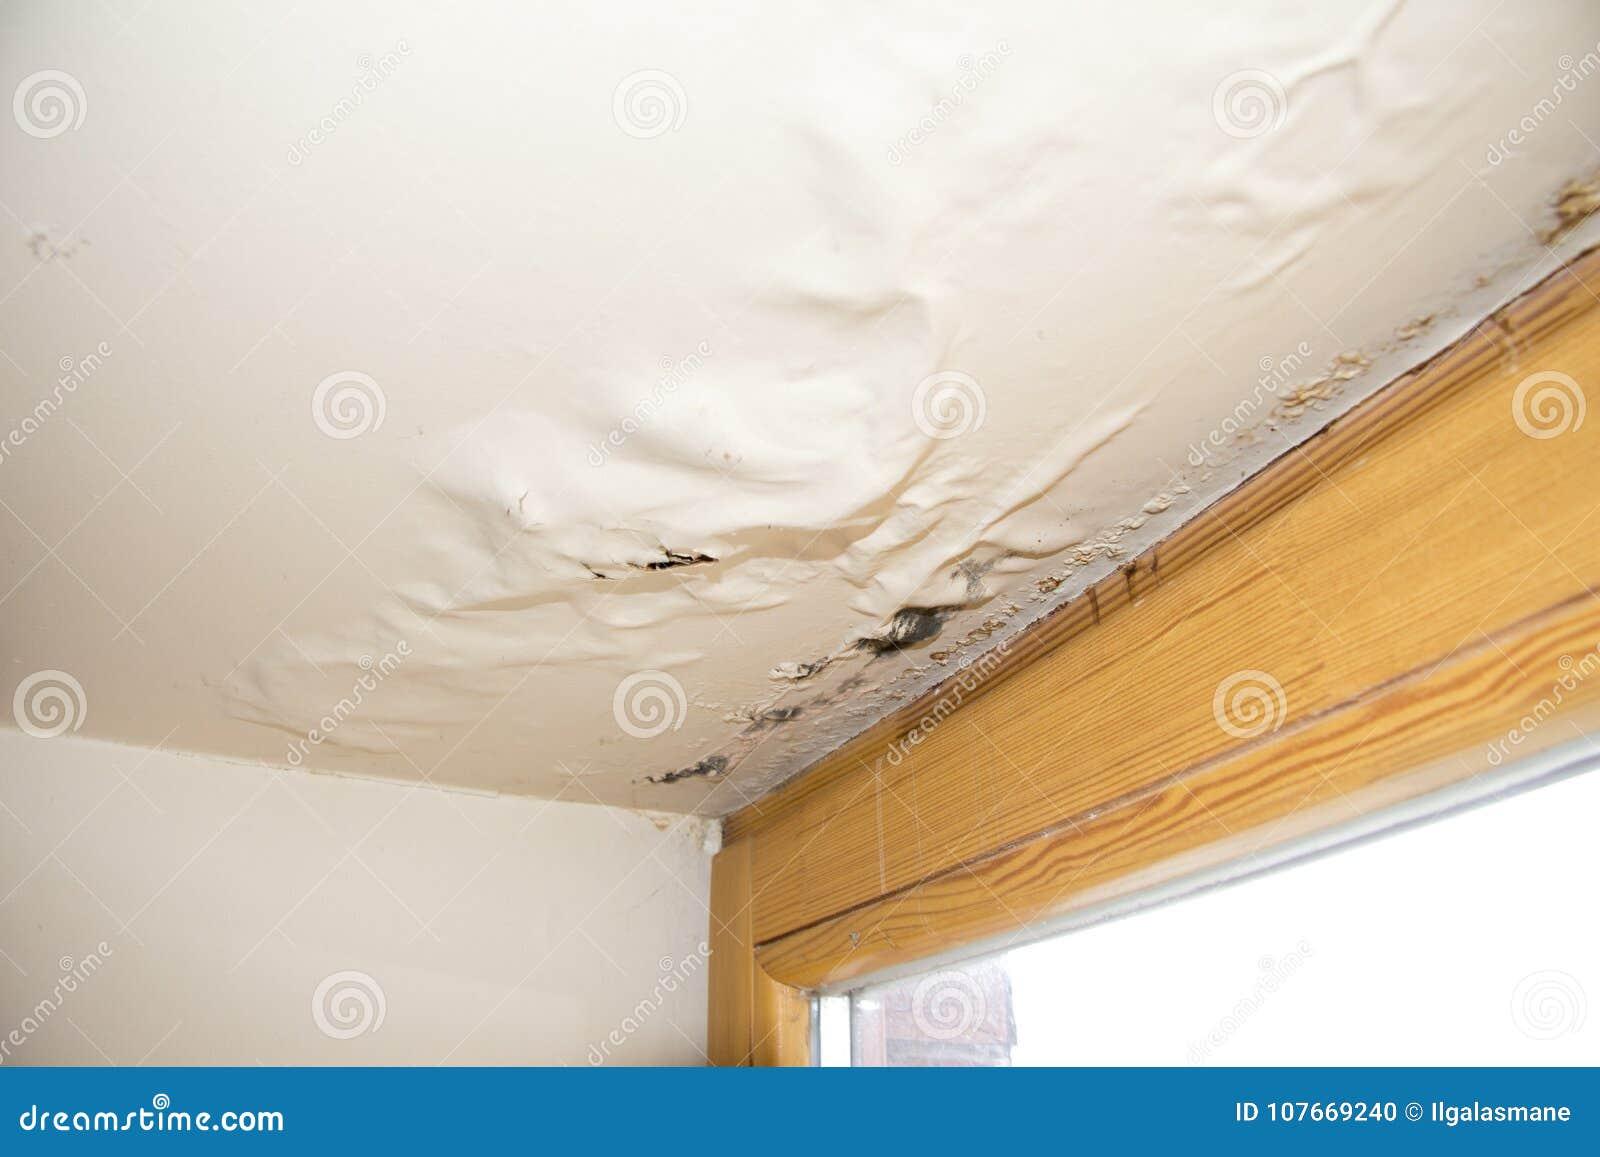 Water, vochtigheid beschadigd plafond naast venster